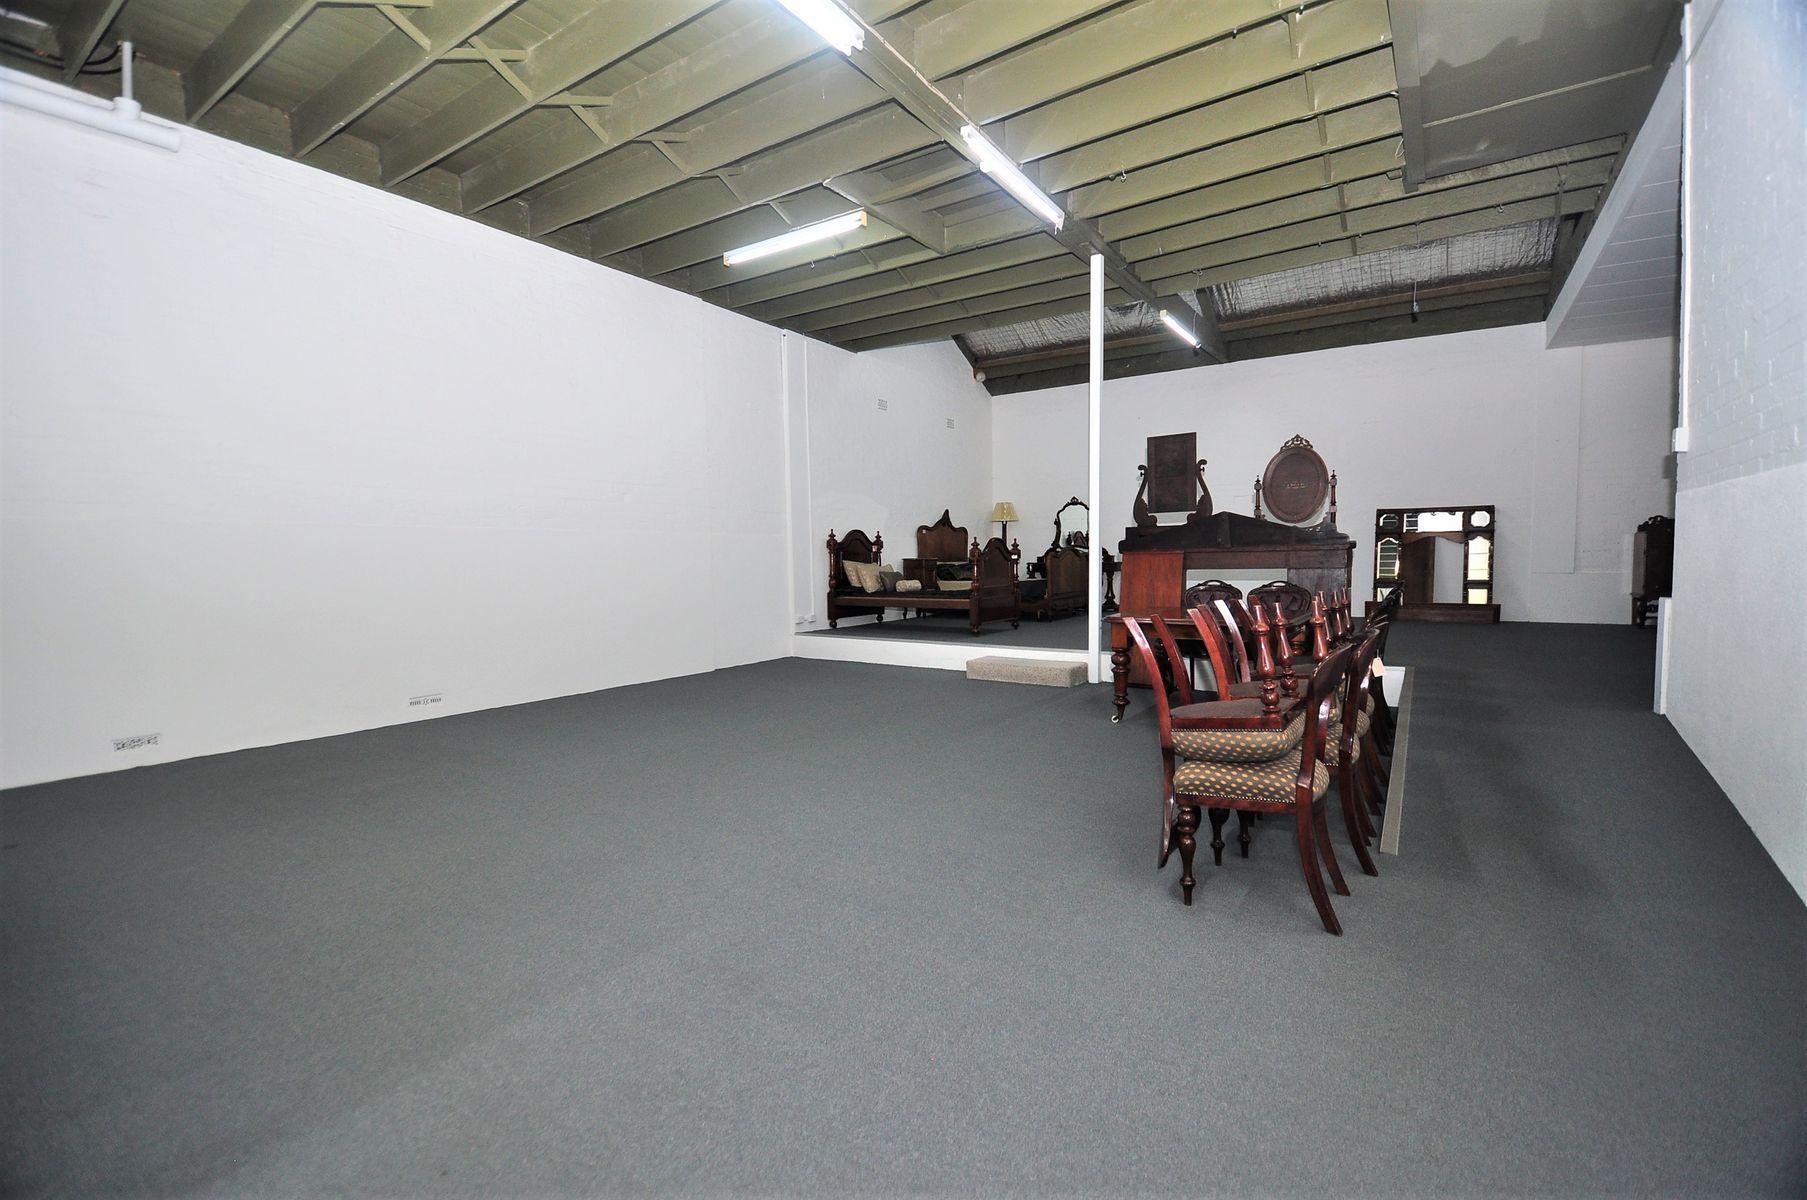 369  Hargreaves Street, Bendigo, VIC 3550